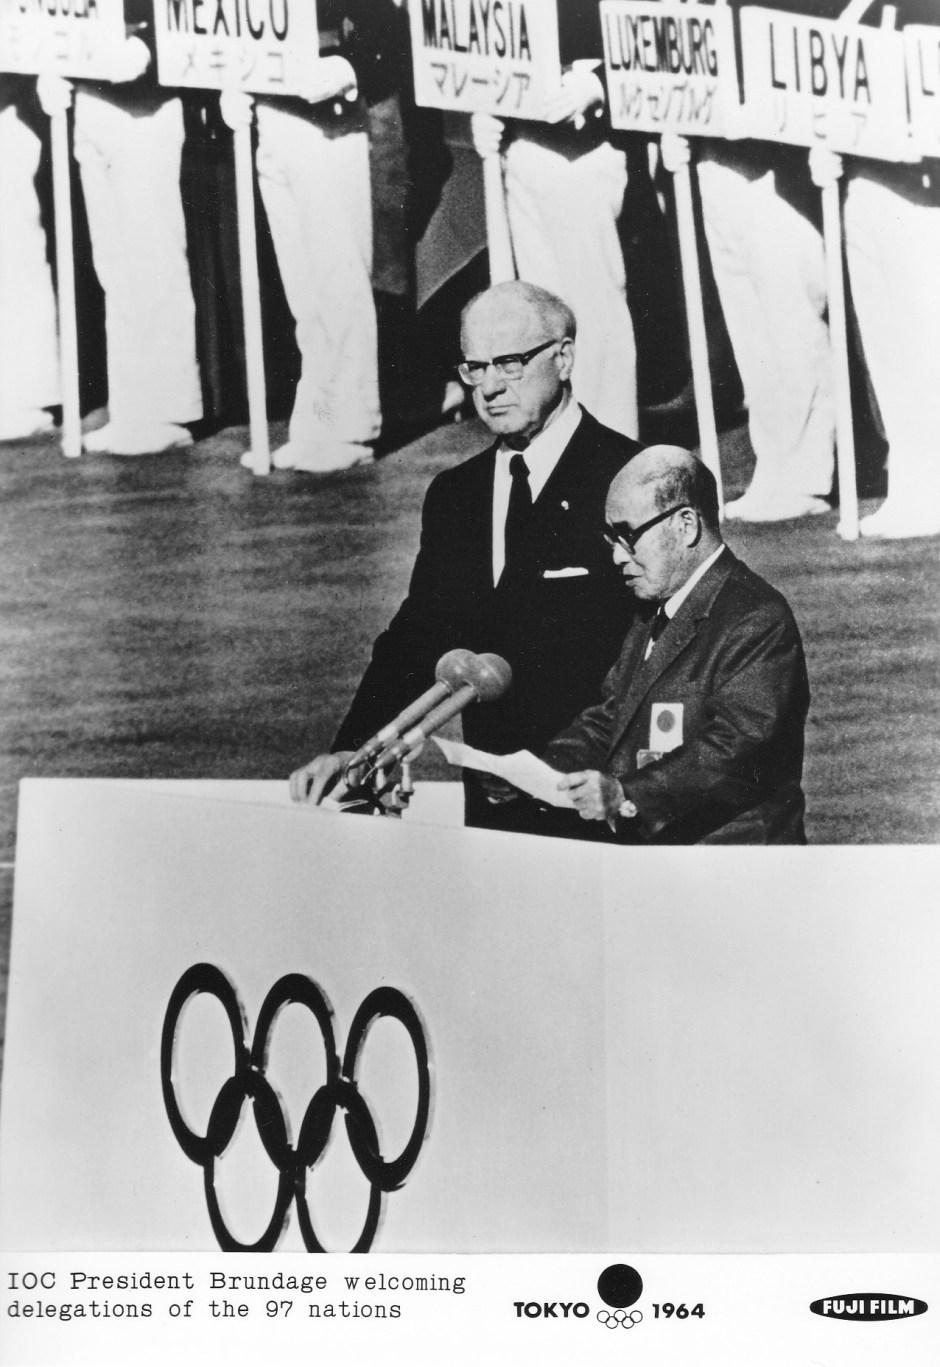 Fuji Film 3_IOC President Avery Brundage's Welcome